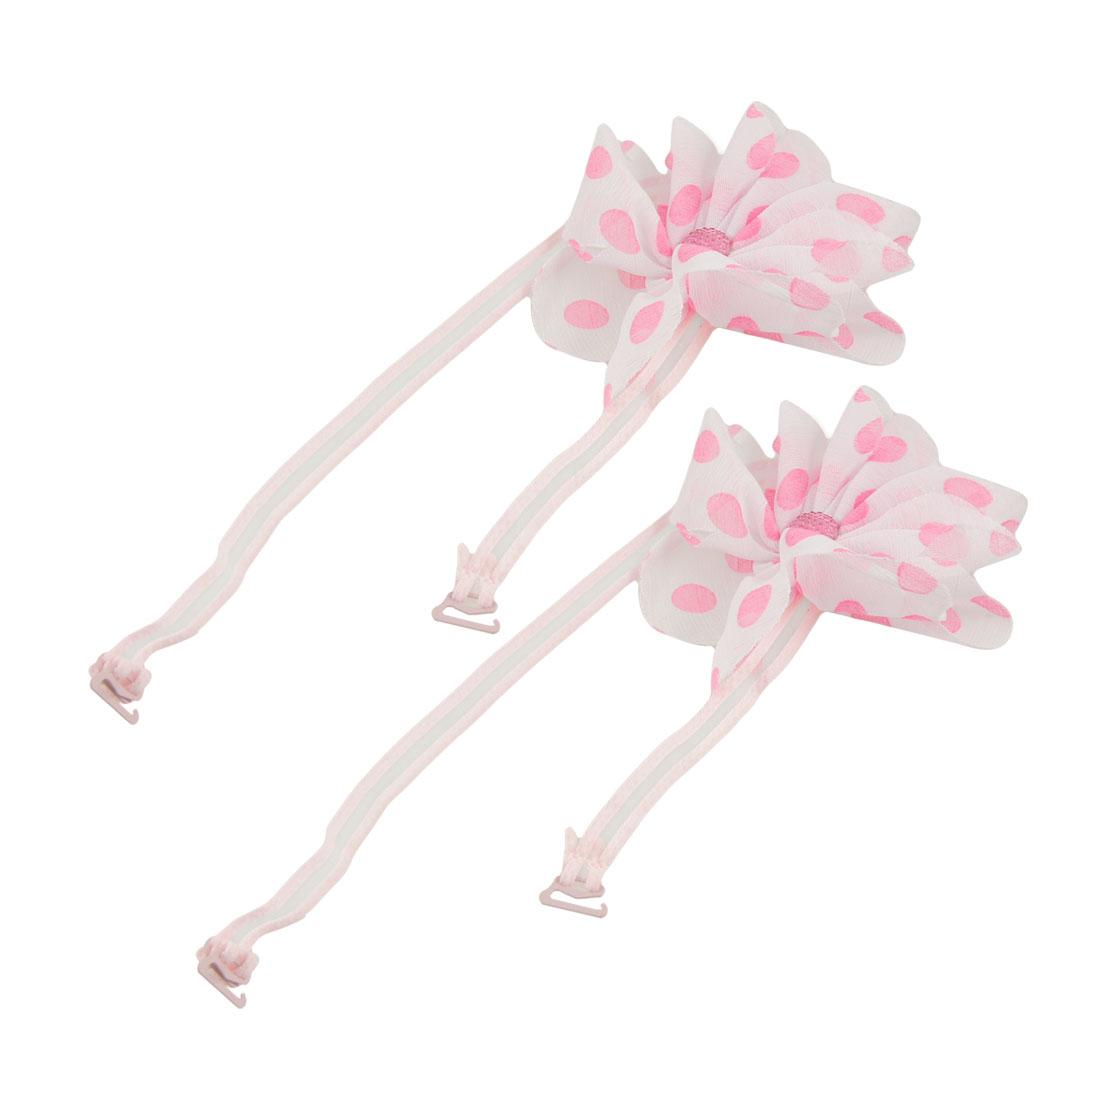 2 Pcs Pink White Flower Accent Elastic Bra Shoulder Straps for Ladies